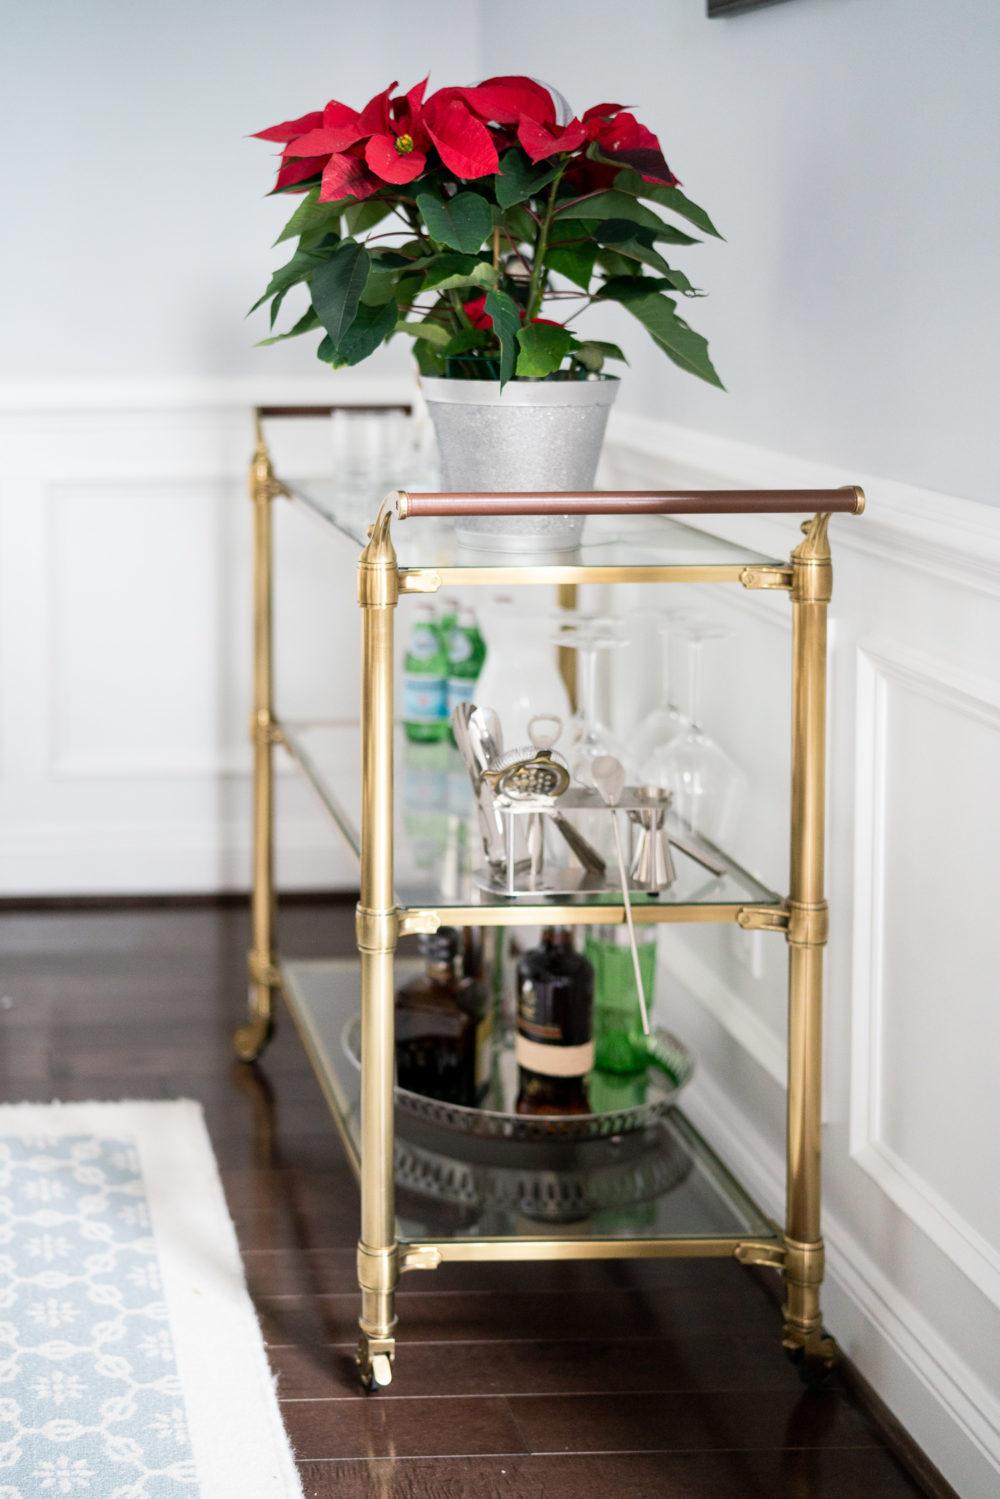 Petite Fashion Blog | Our Home for the Holidays | Christmas Decor | Flocked Christmas Tree |